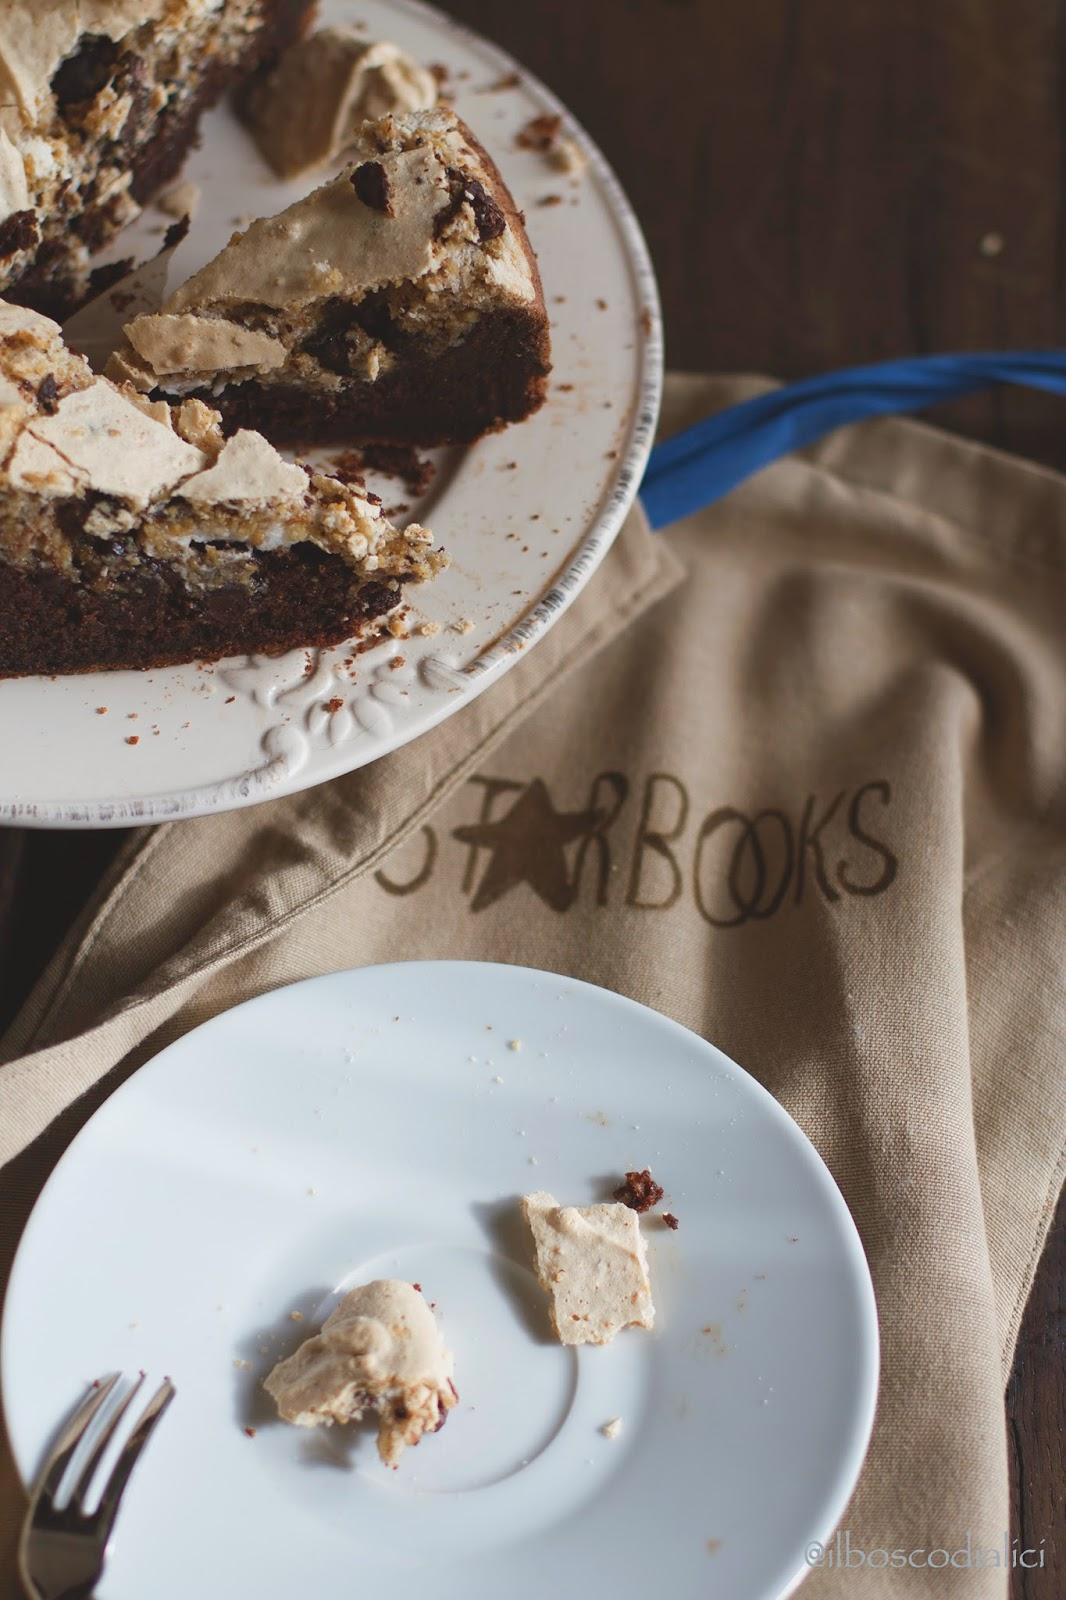 torta al cioccolato e nocciole con meringa - chocolate and hazelnut meringue cake